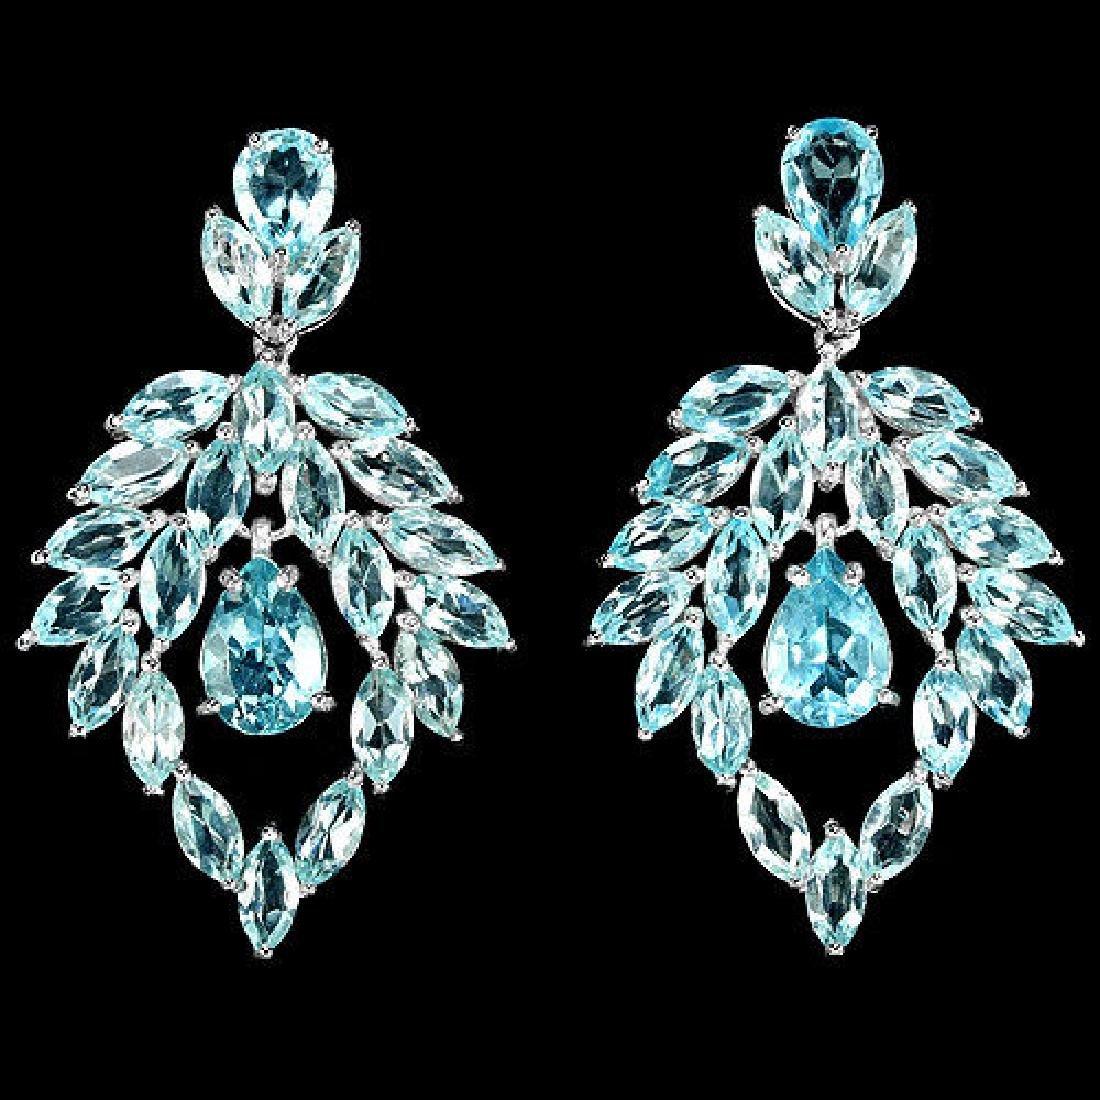 Natural AAA SKY BLUE TOPAZ Earrings